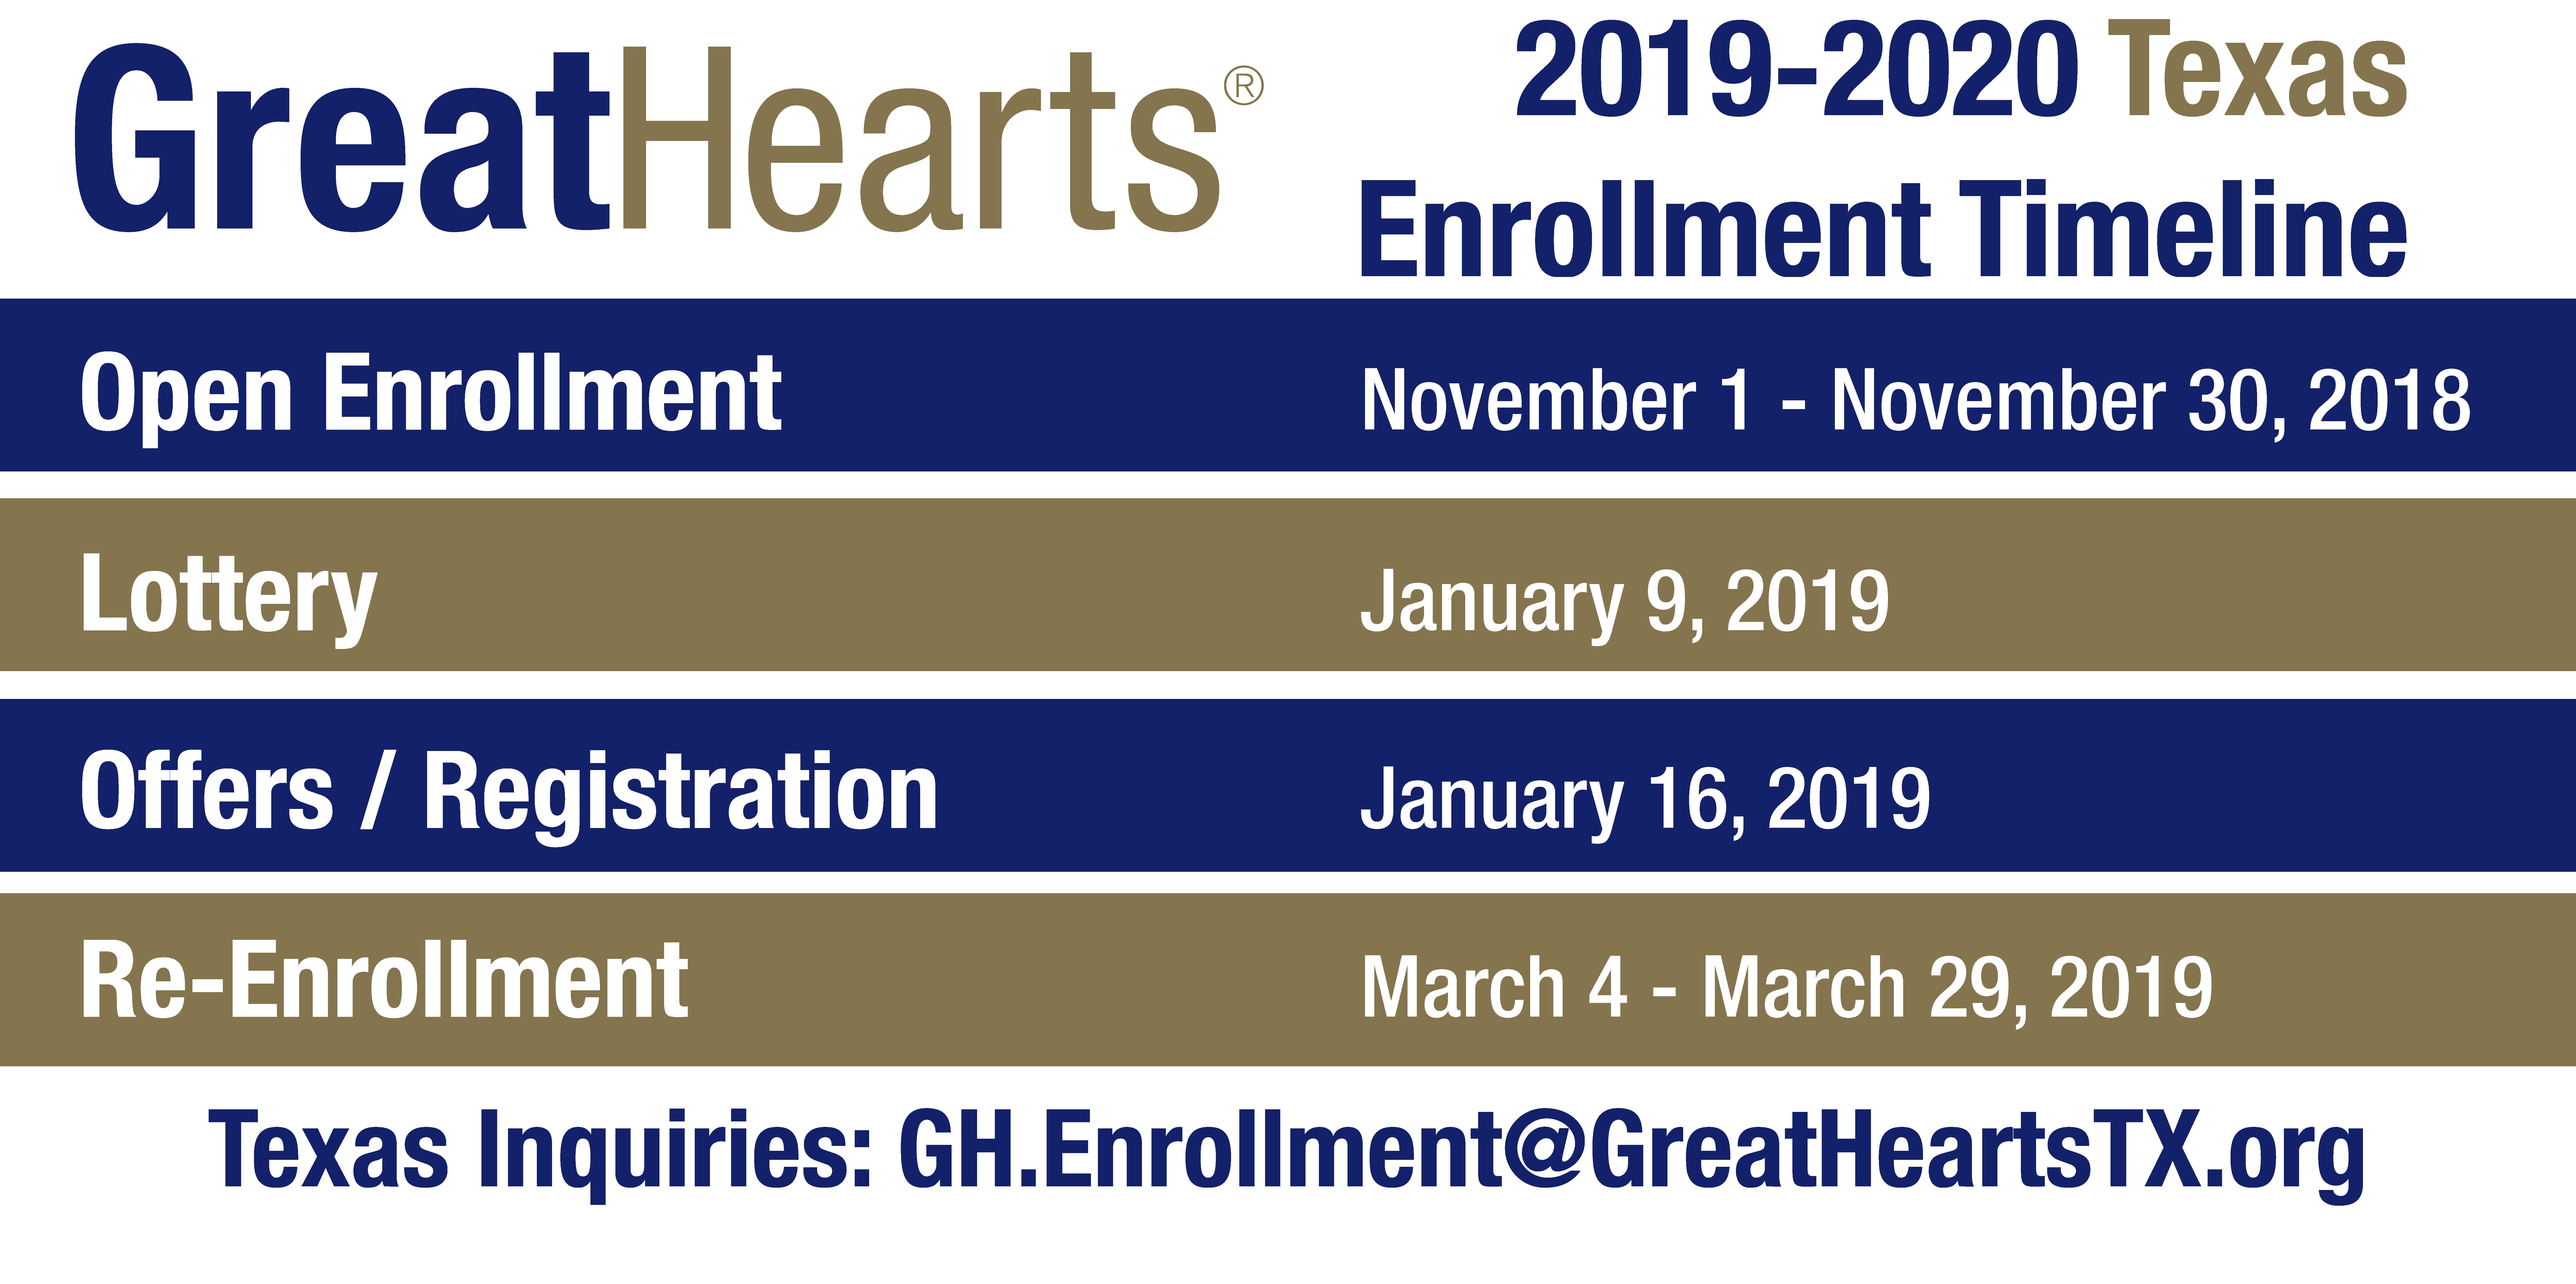 2019-2020 Enrollment Texas timeline